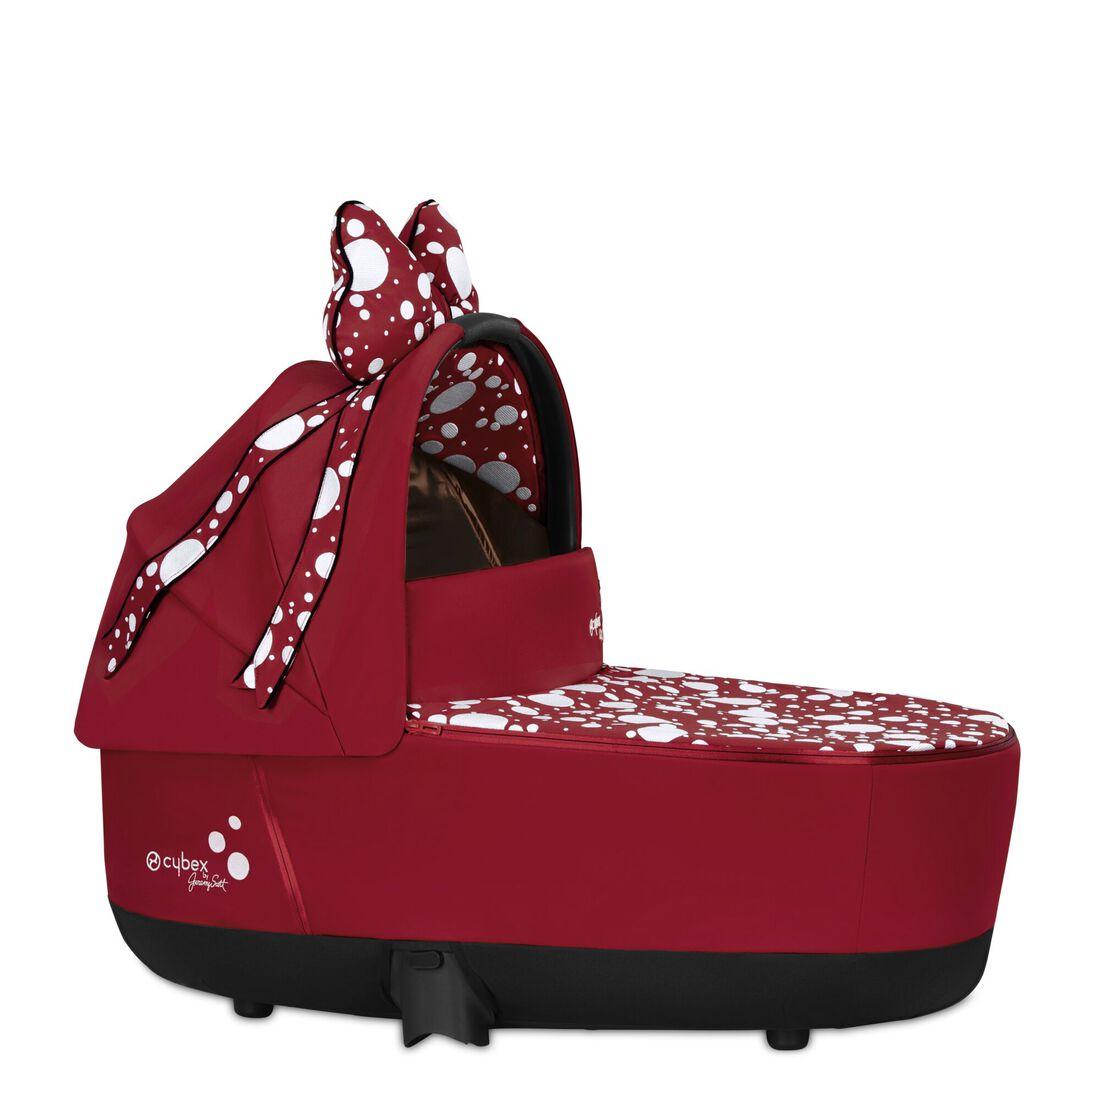 CYBEX Priam Lux Carry Cot - Petticoat Red in Petticoat Red large Bild 1